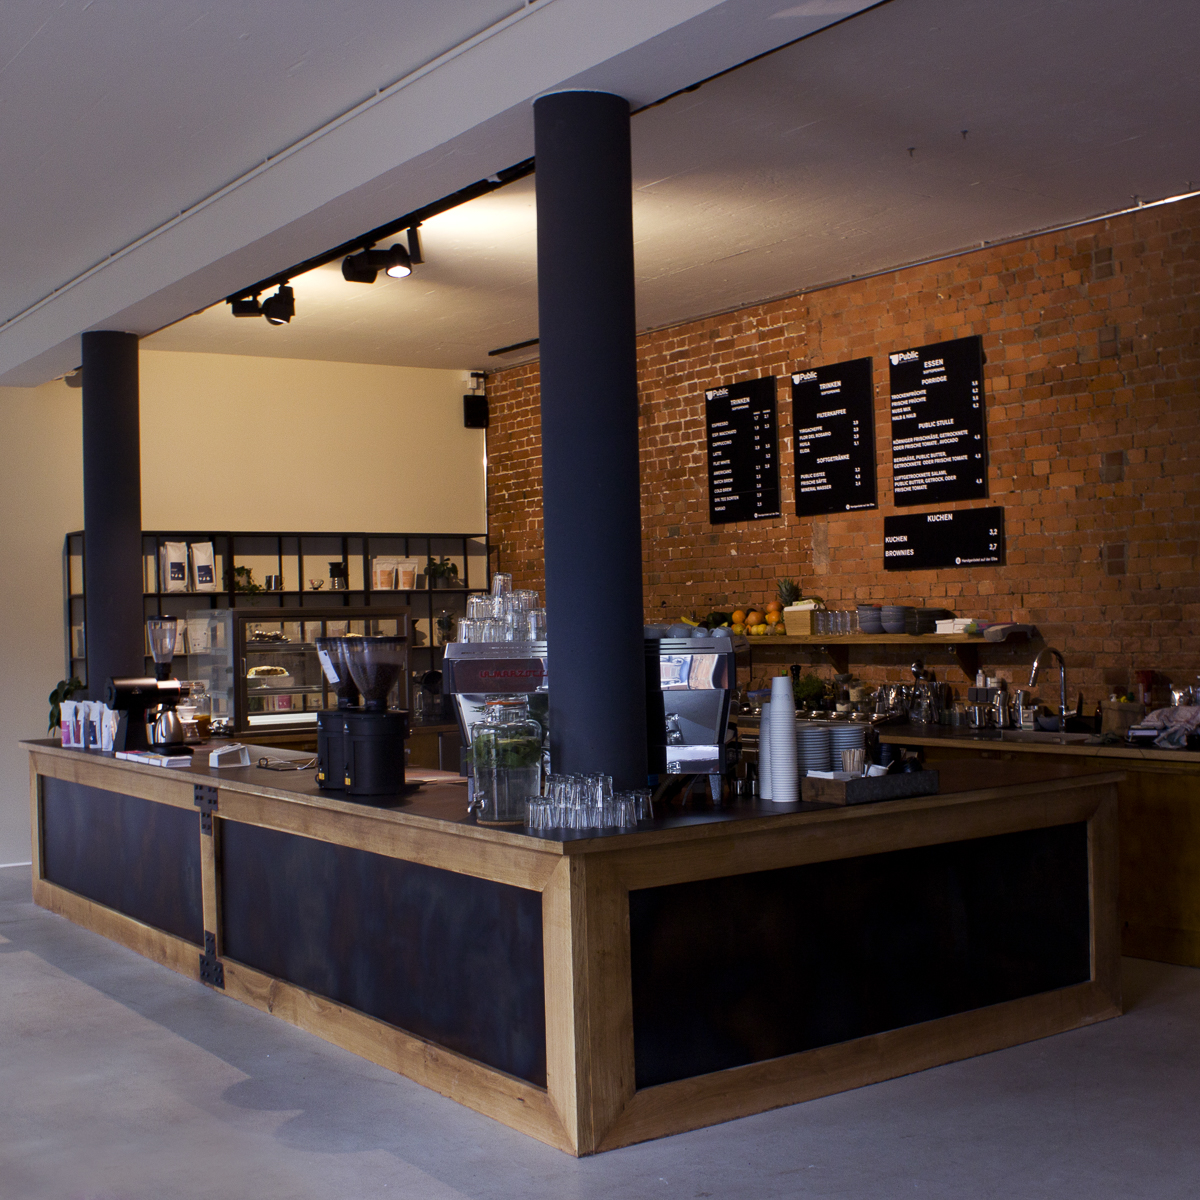 Public Coffee Roasters Hamburg Winterhude-7